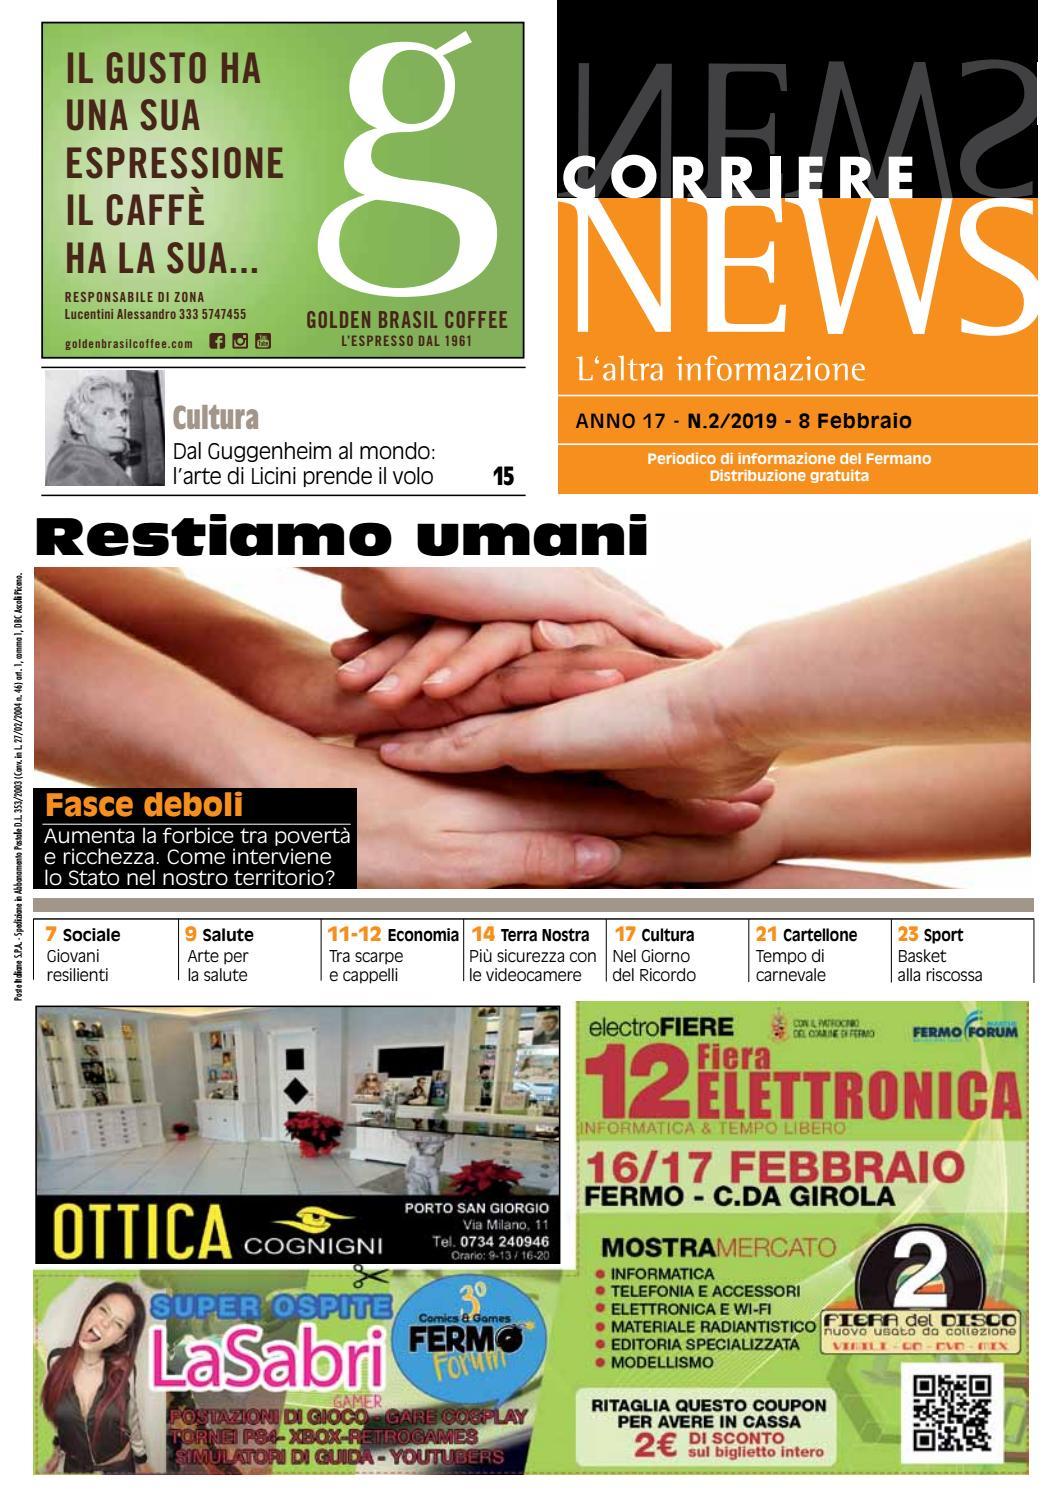 b3c66667894b CORRIERE NEWS FEBBRAIO 2019 by Corriere News - issuu